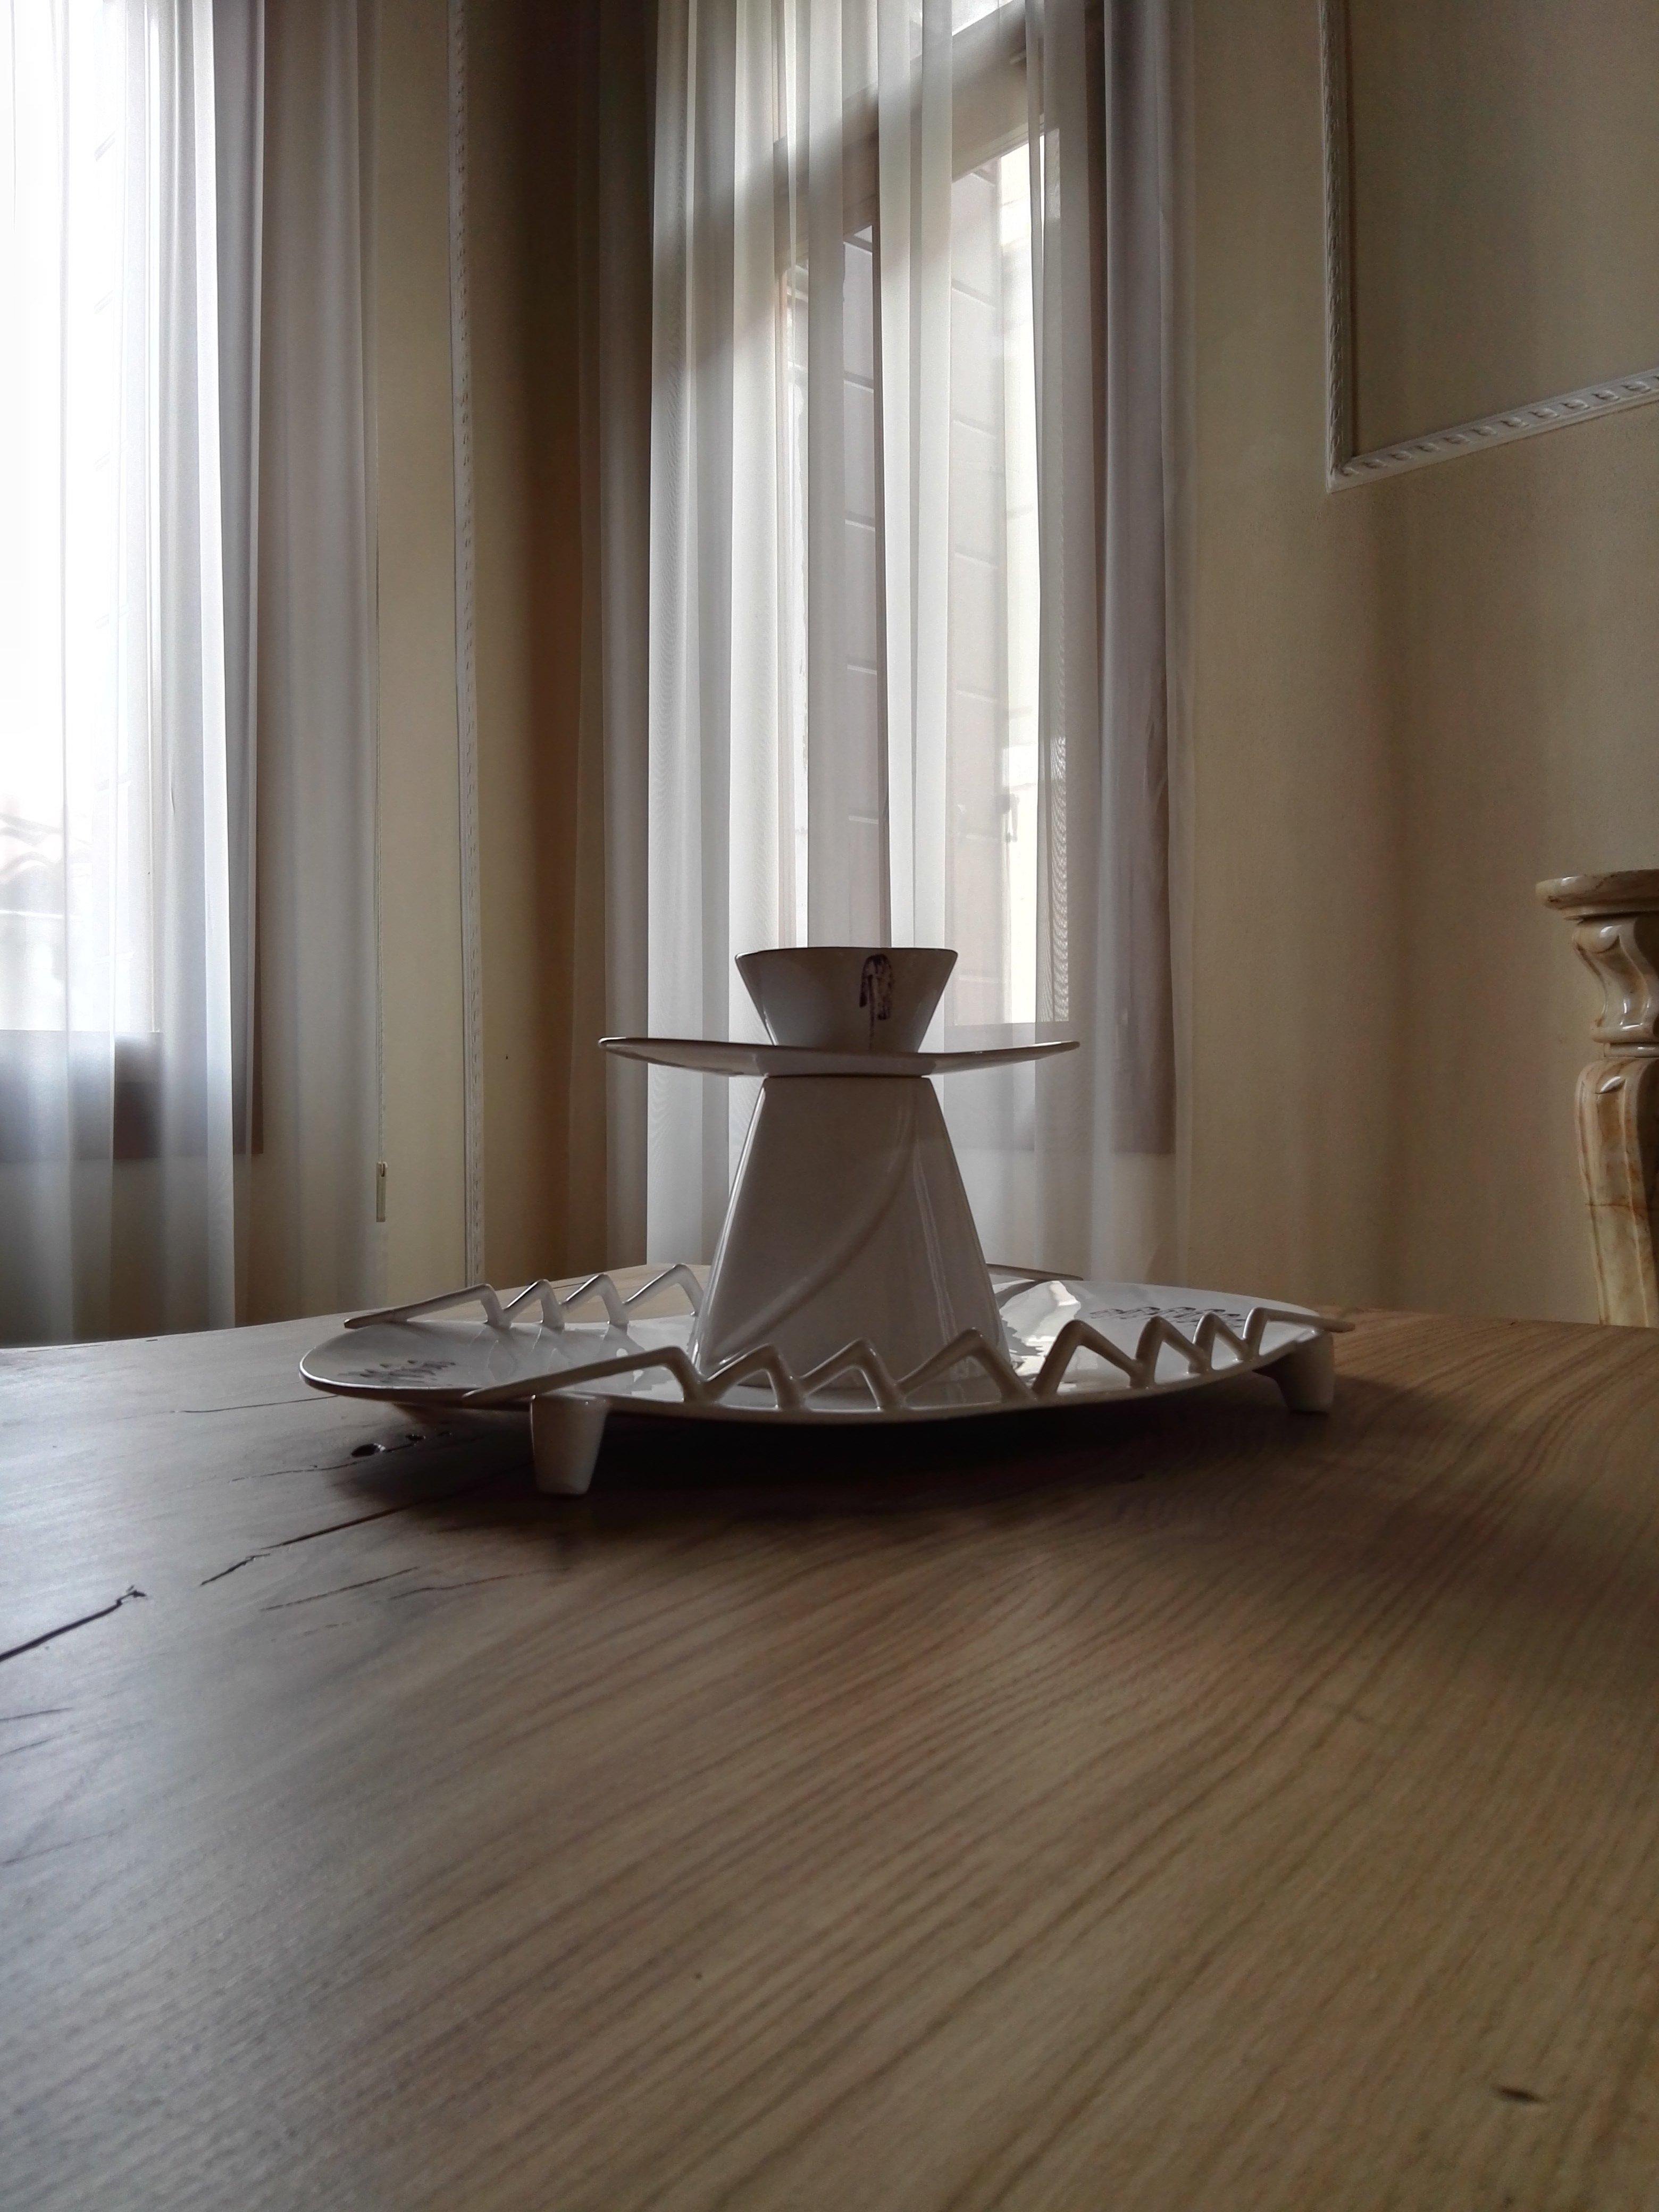 Venezia - Venice Design Week: feles in fabula